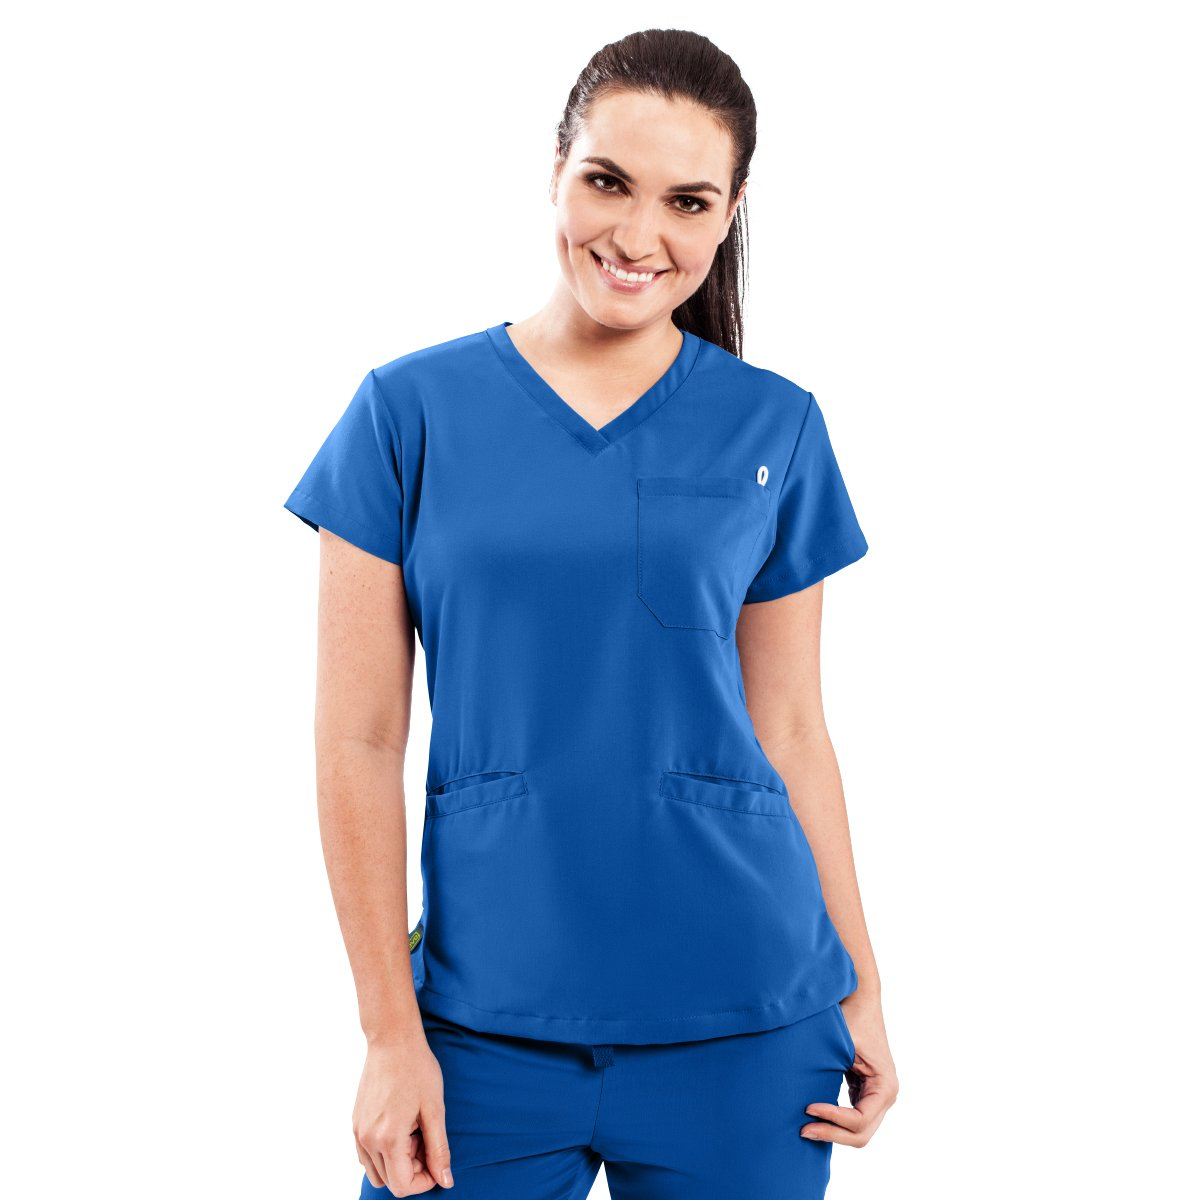 e894902802f ave Women's Medical Scrub Top, Berkeley ave, V-Neck Scrub Shirt, 2 Pockets,  Wrinkle Resistant, Great for Nurses, Royal Blue, X-Small